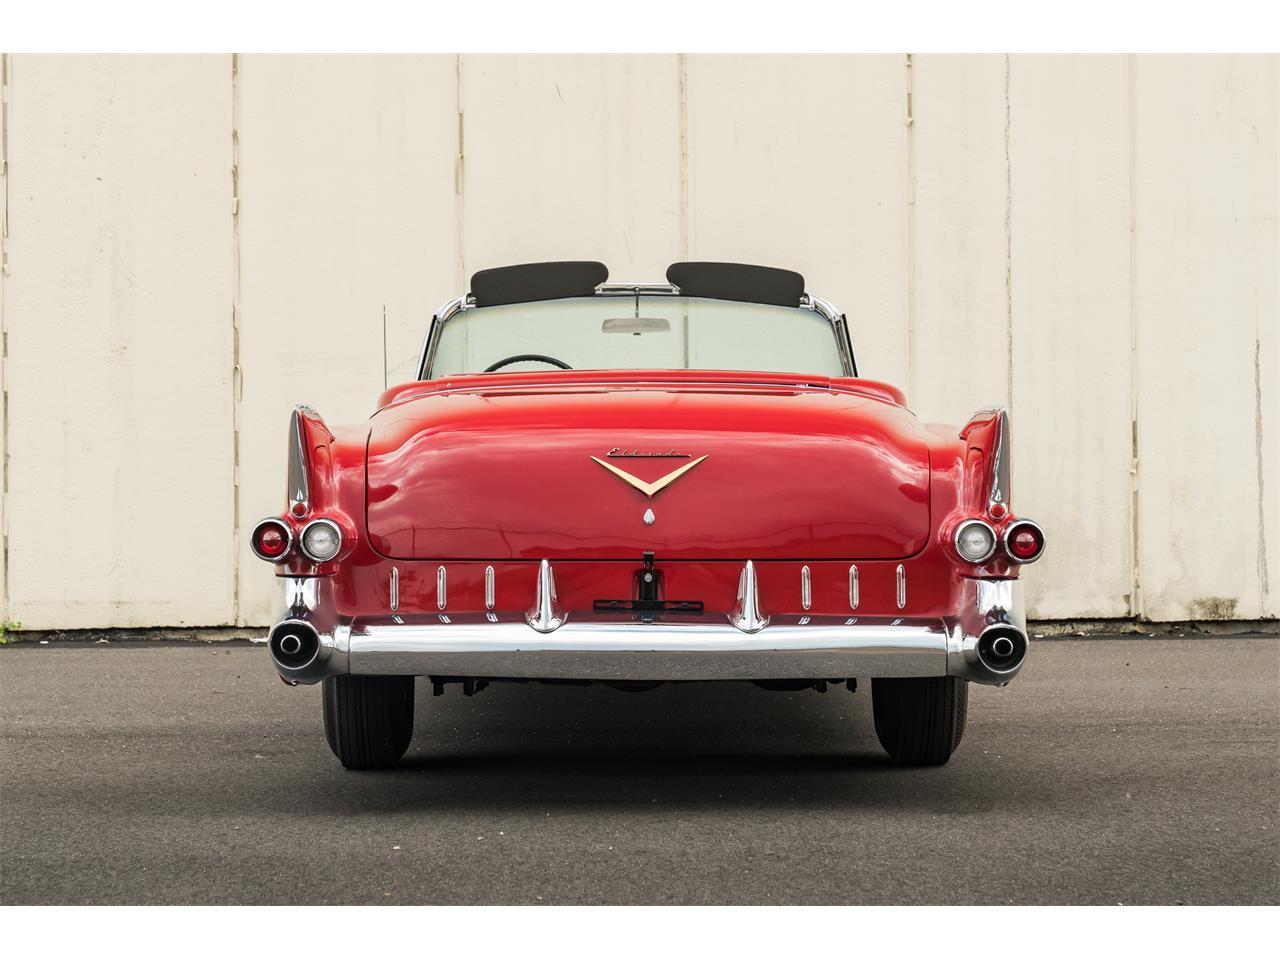 1955 Cadillac Eldorado (CC-1262997) for sale in Philadelphia, Pennsylvania